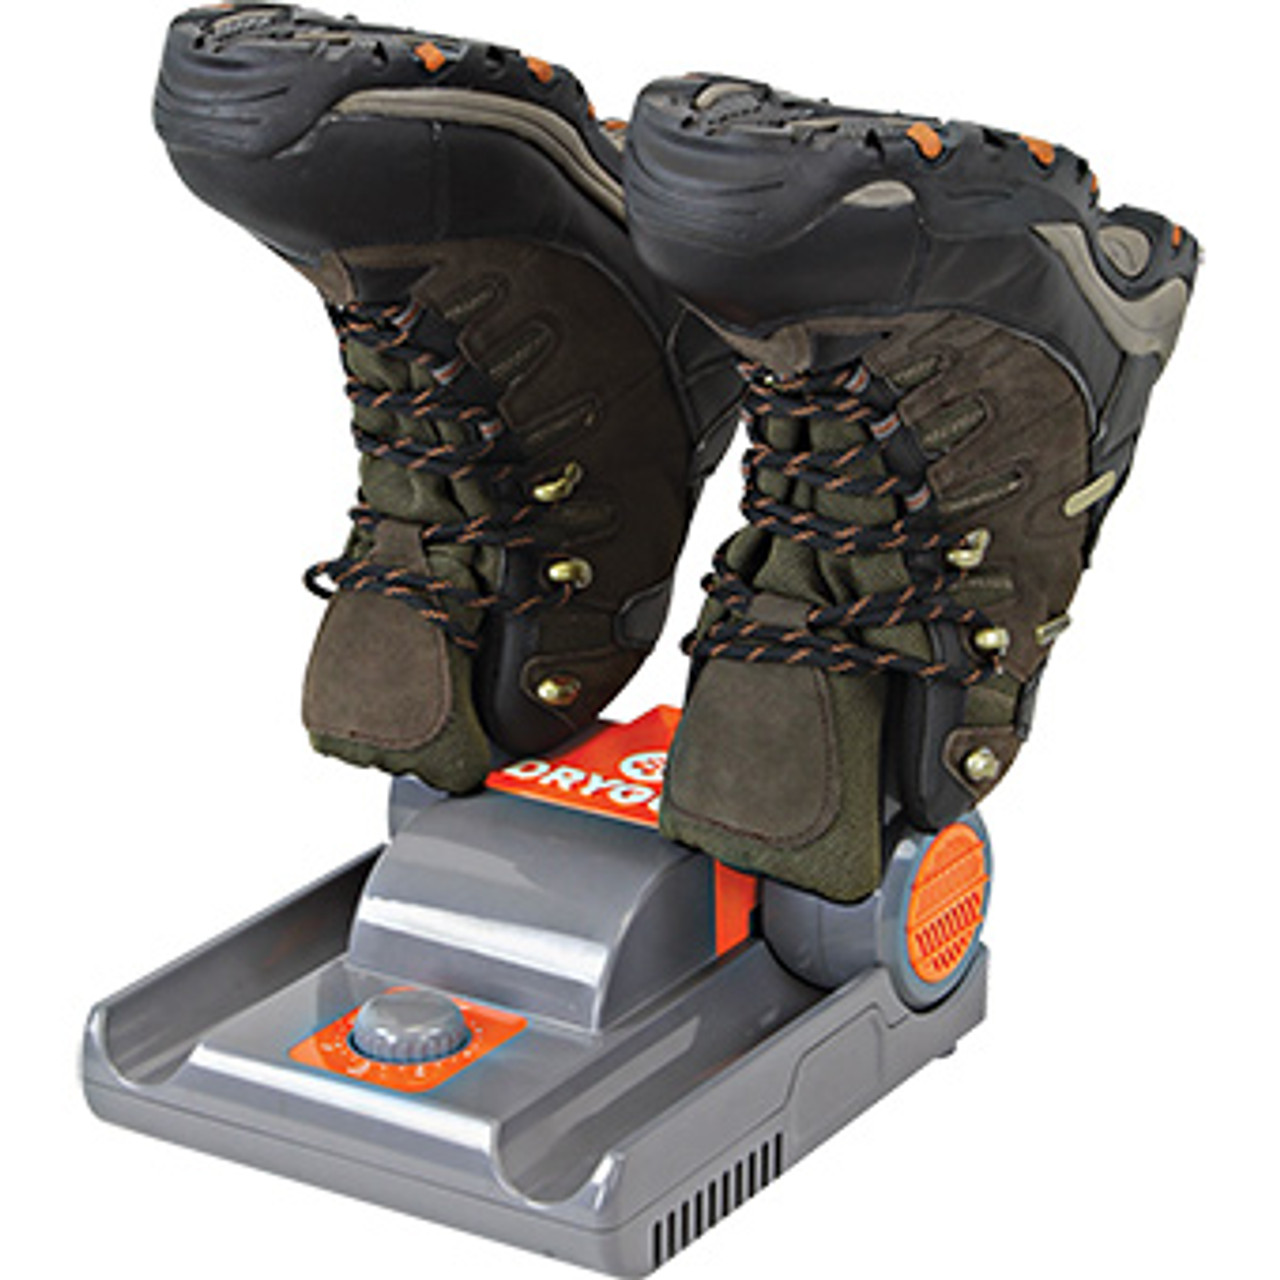 dry guy boot dryer